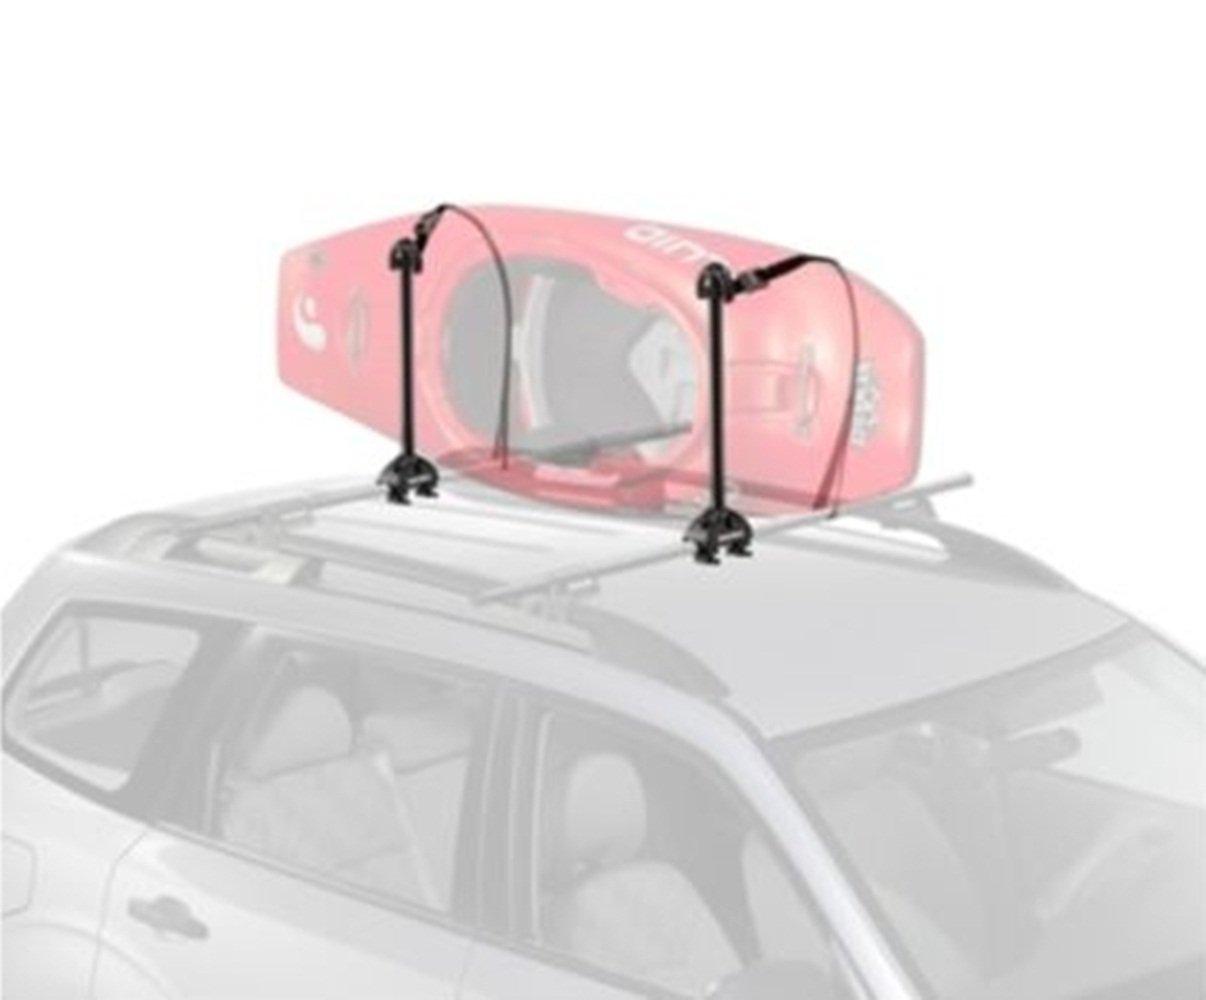 Yakima Kayak Rack Straps Stacker Rooftop Carrier w/straps / tiedowns